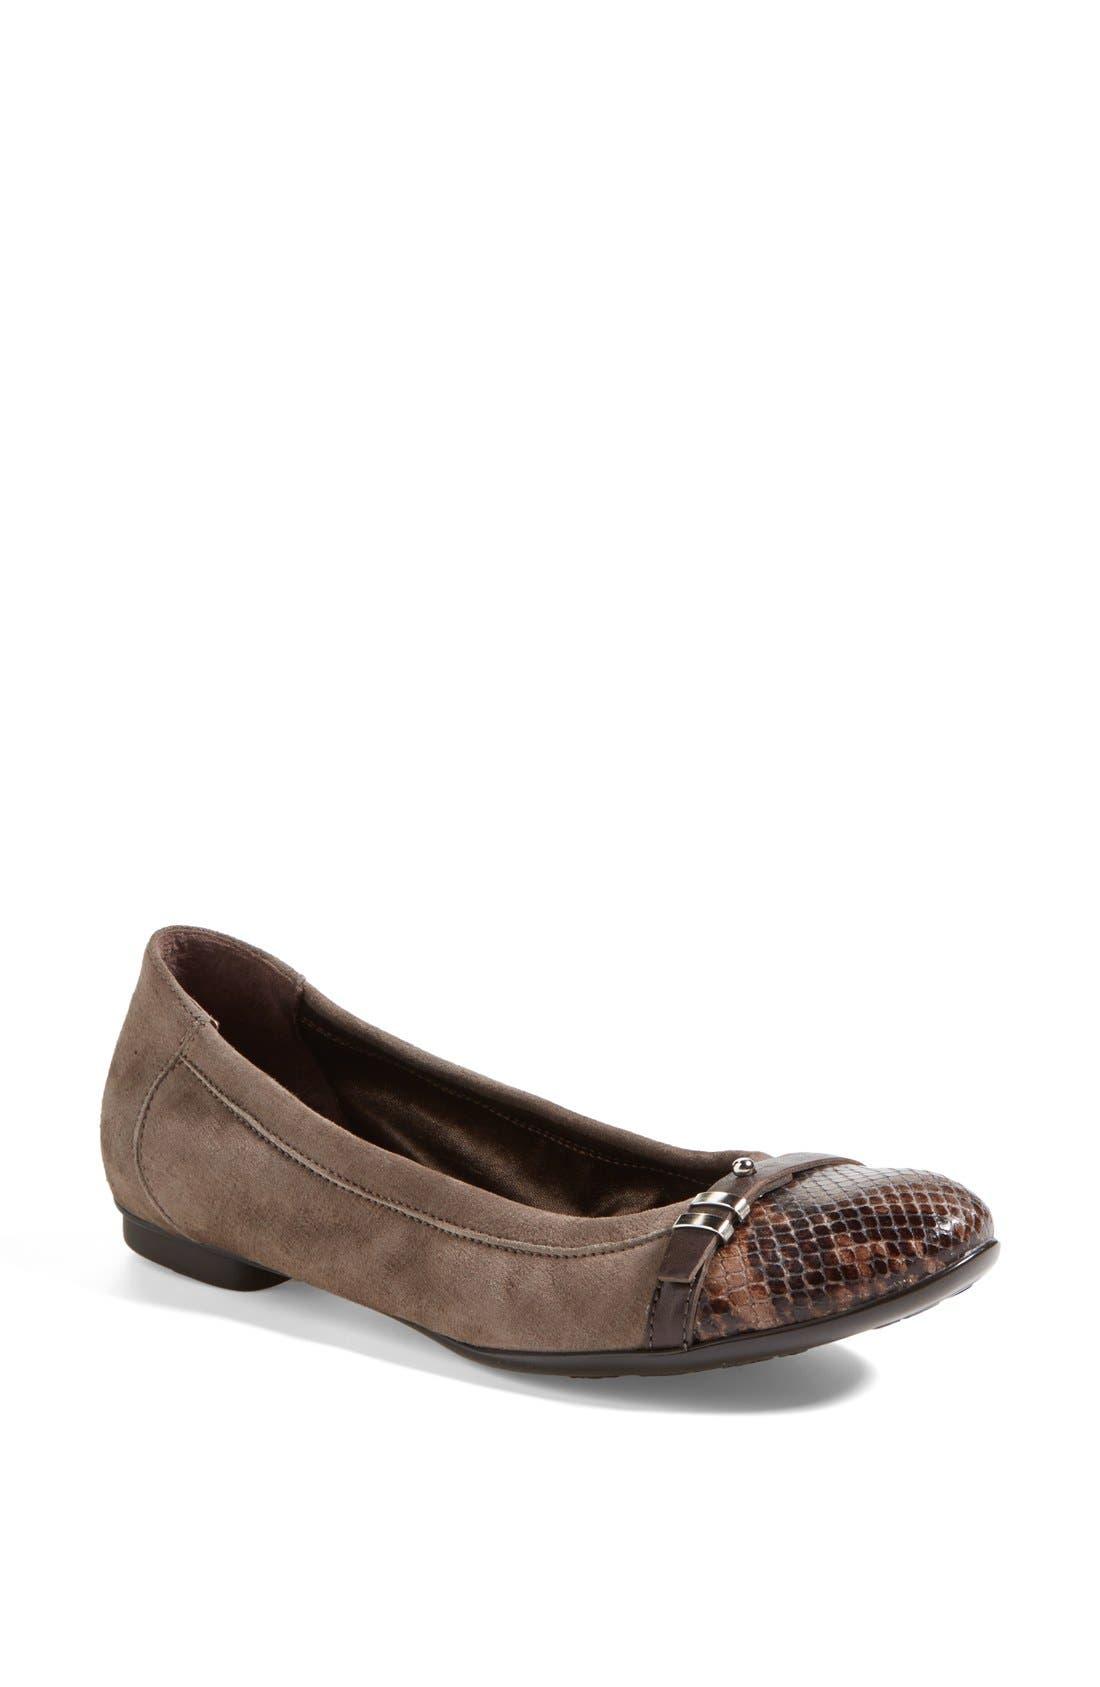 Alternate Image 1 Selected - Attilio Giusti Leombruni 'Bella' Patent & Nappa Leather Ballet Flat